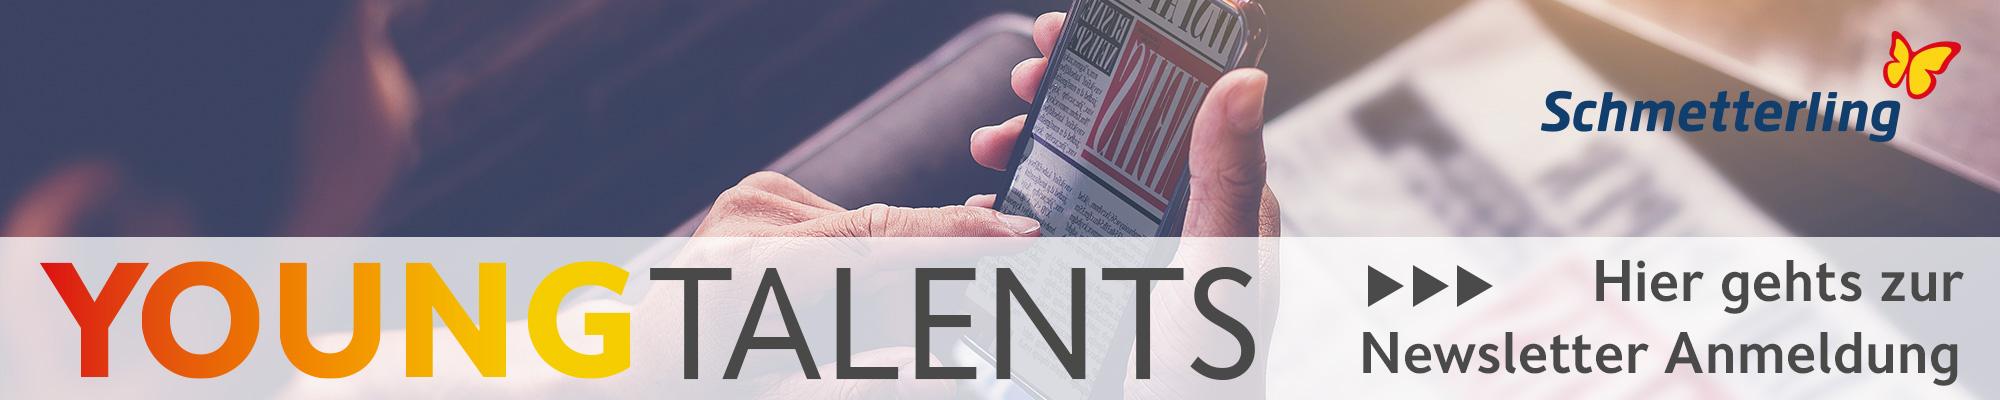 Zur YoungTalents Newsletter Anmeldung